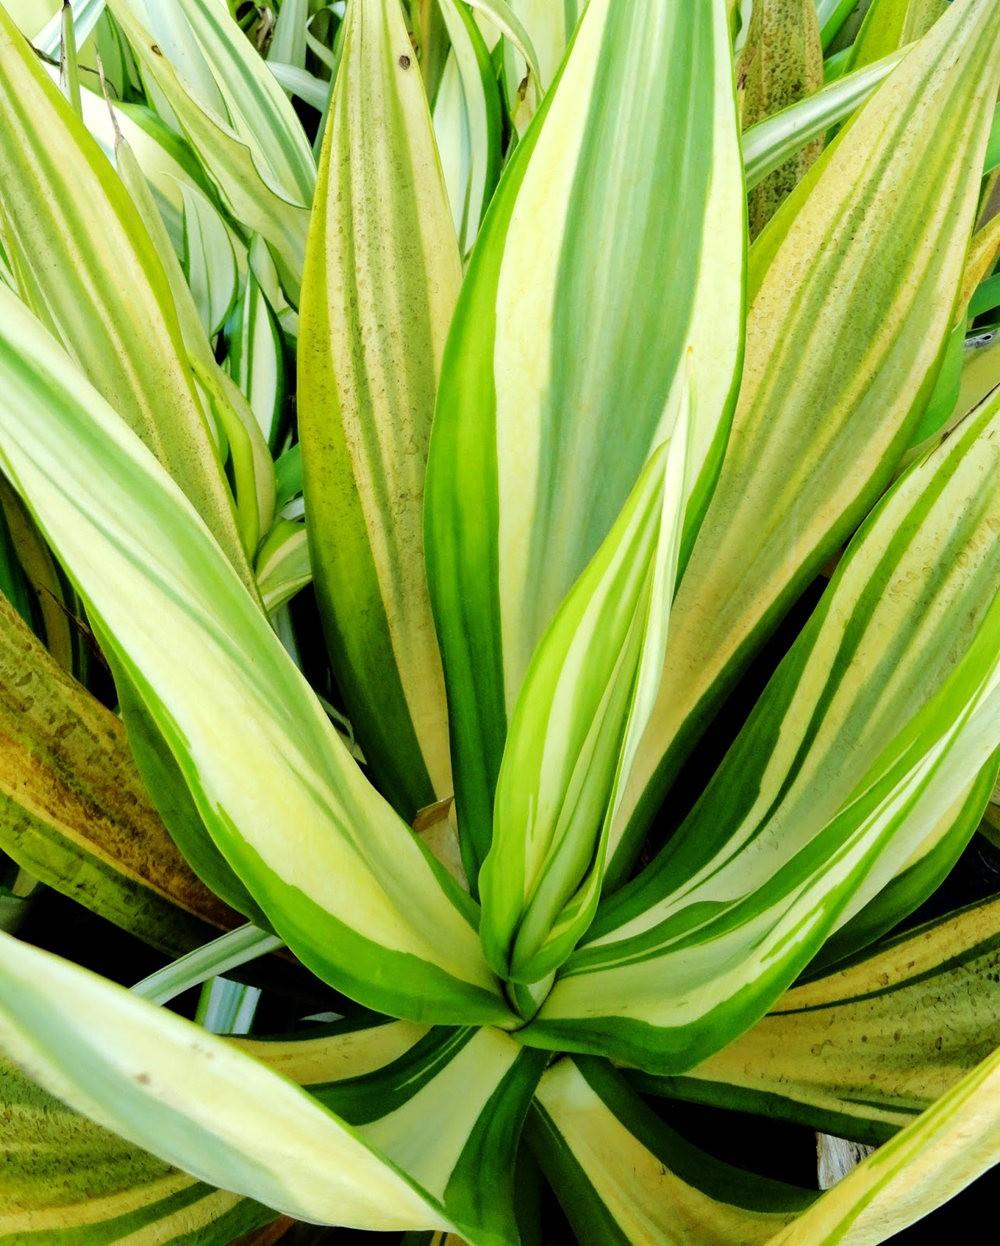 参观Rare Plant Research 苗圃花园_图1-17